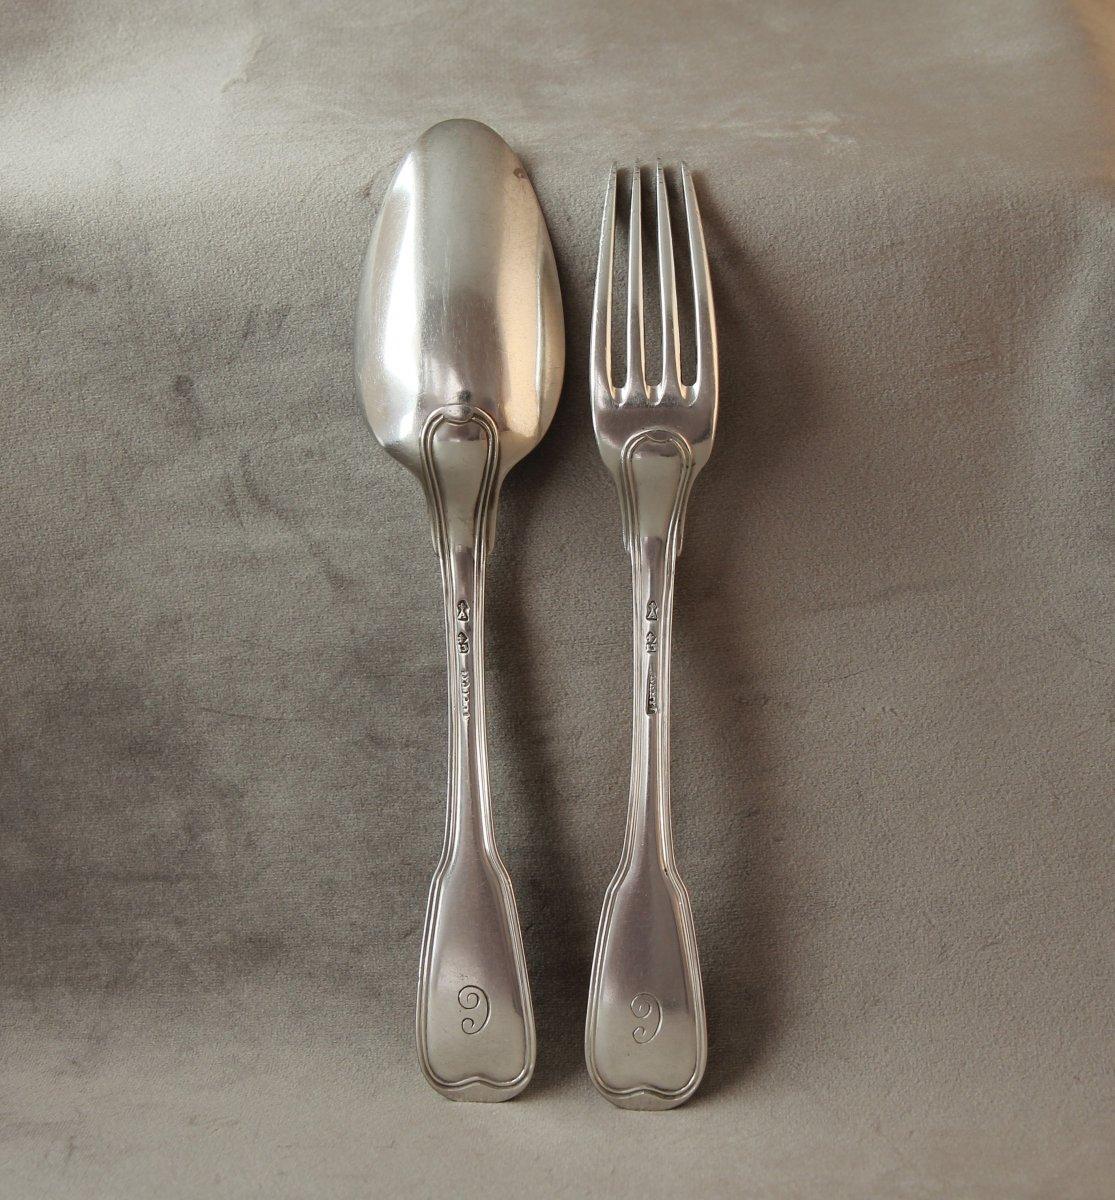 Silver Cutlery, Jacques-henri Alberti, Strasbourg 1776